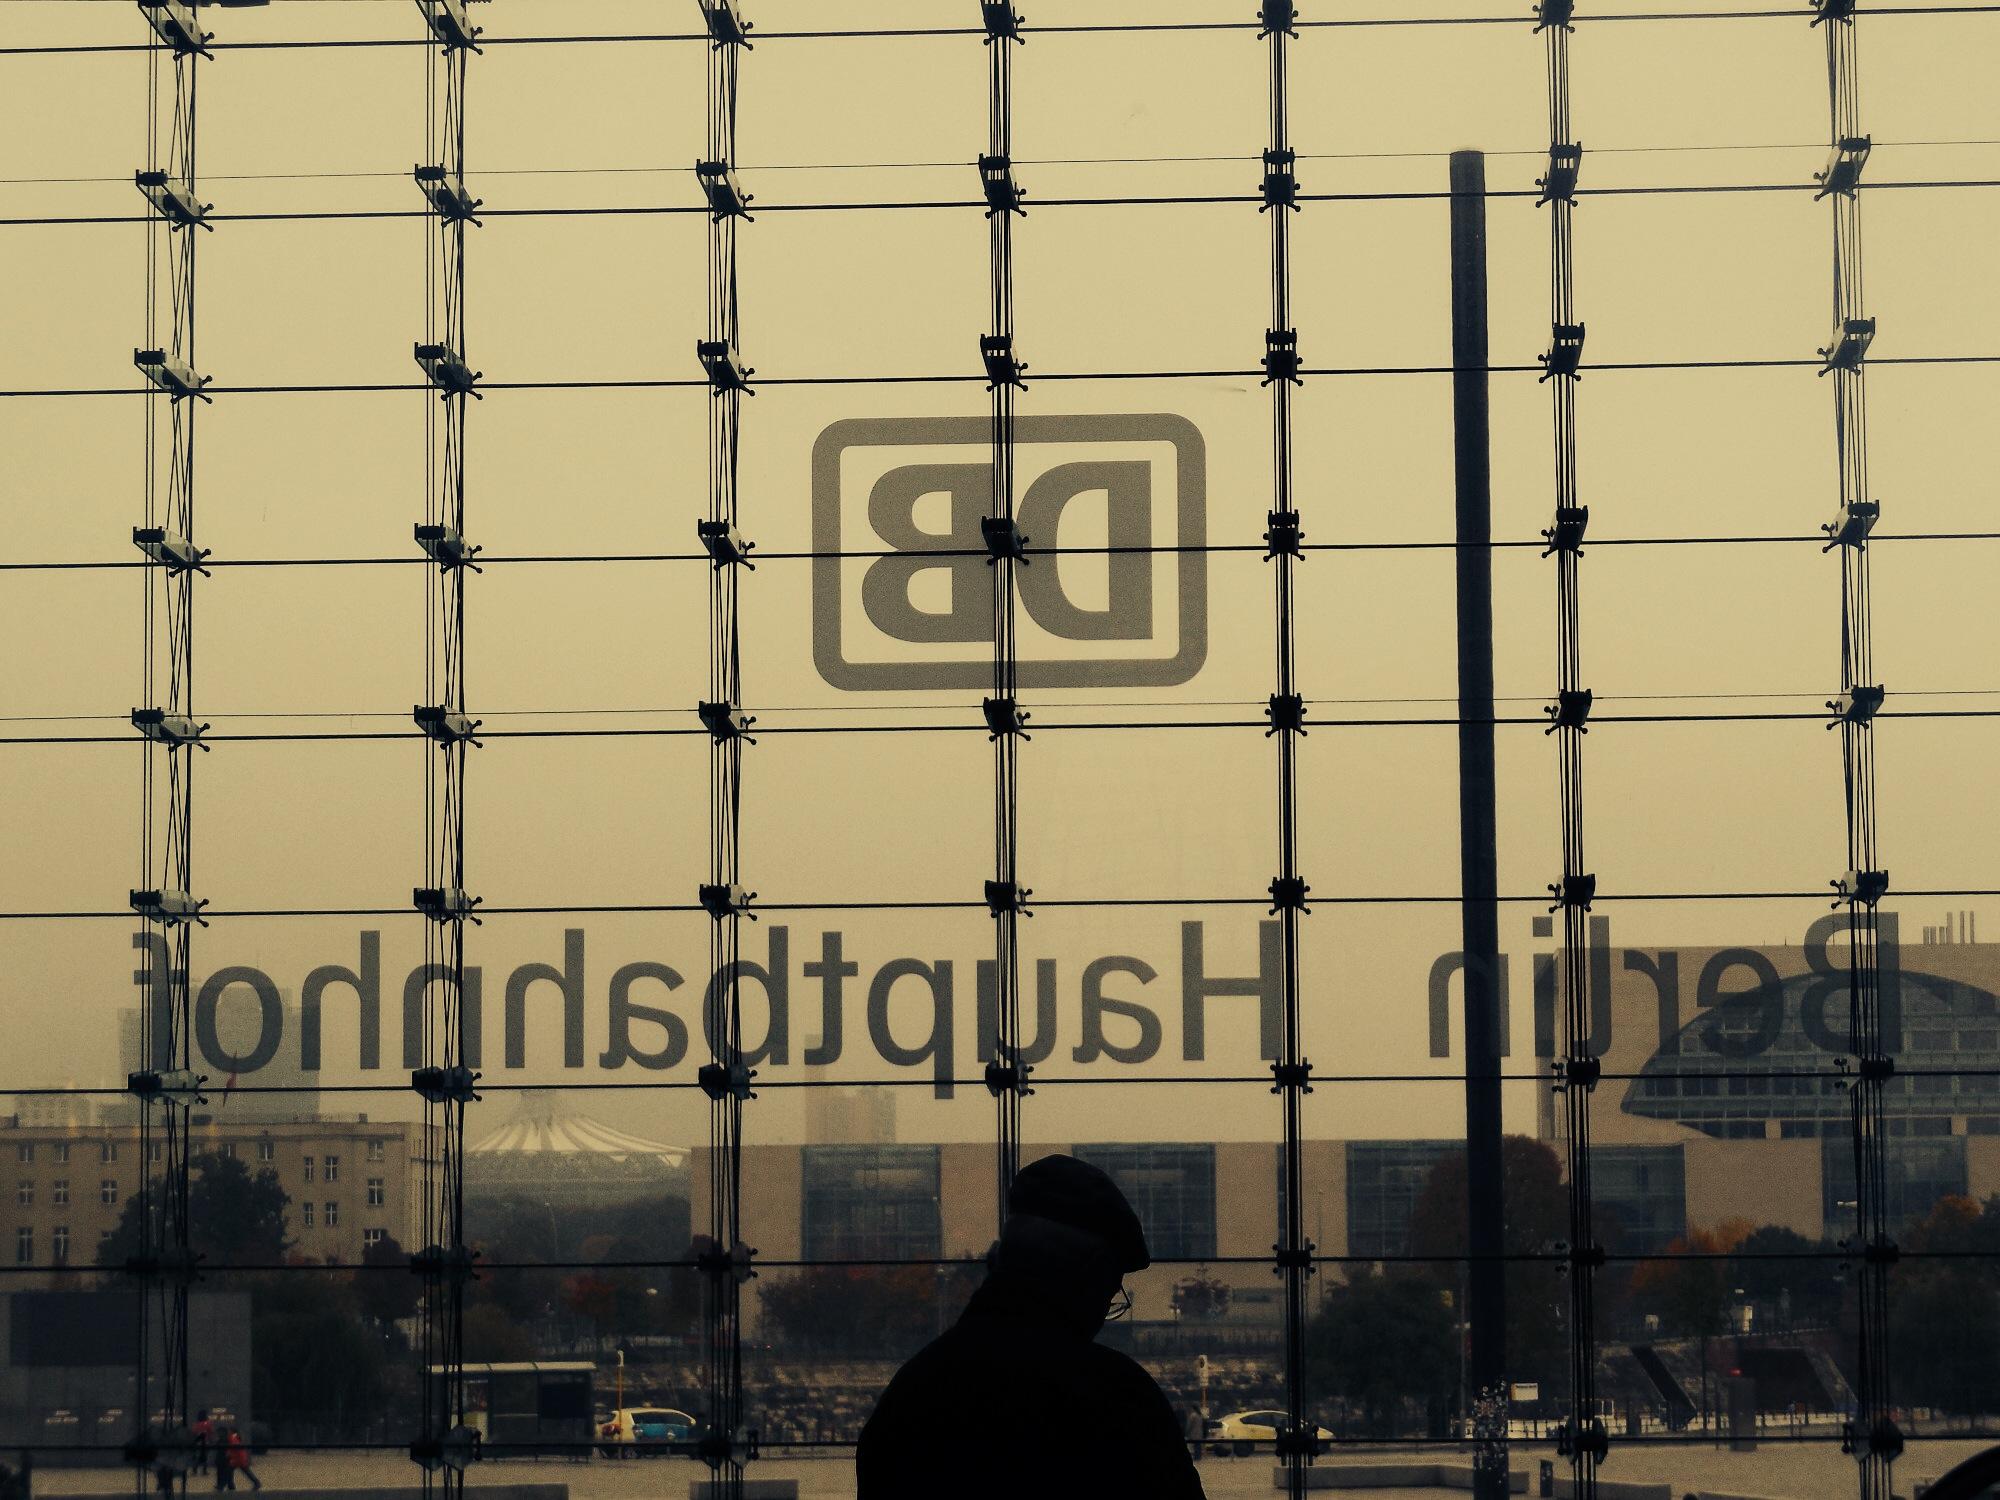 Deutsche Bahn - Germany's national train corporation